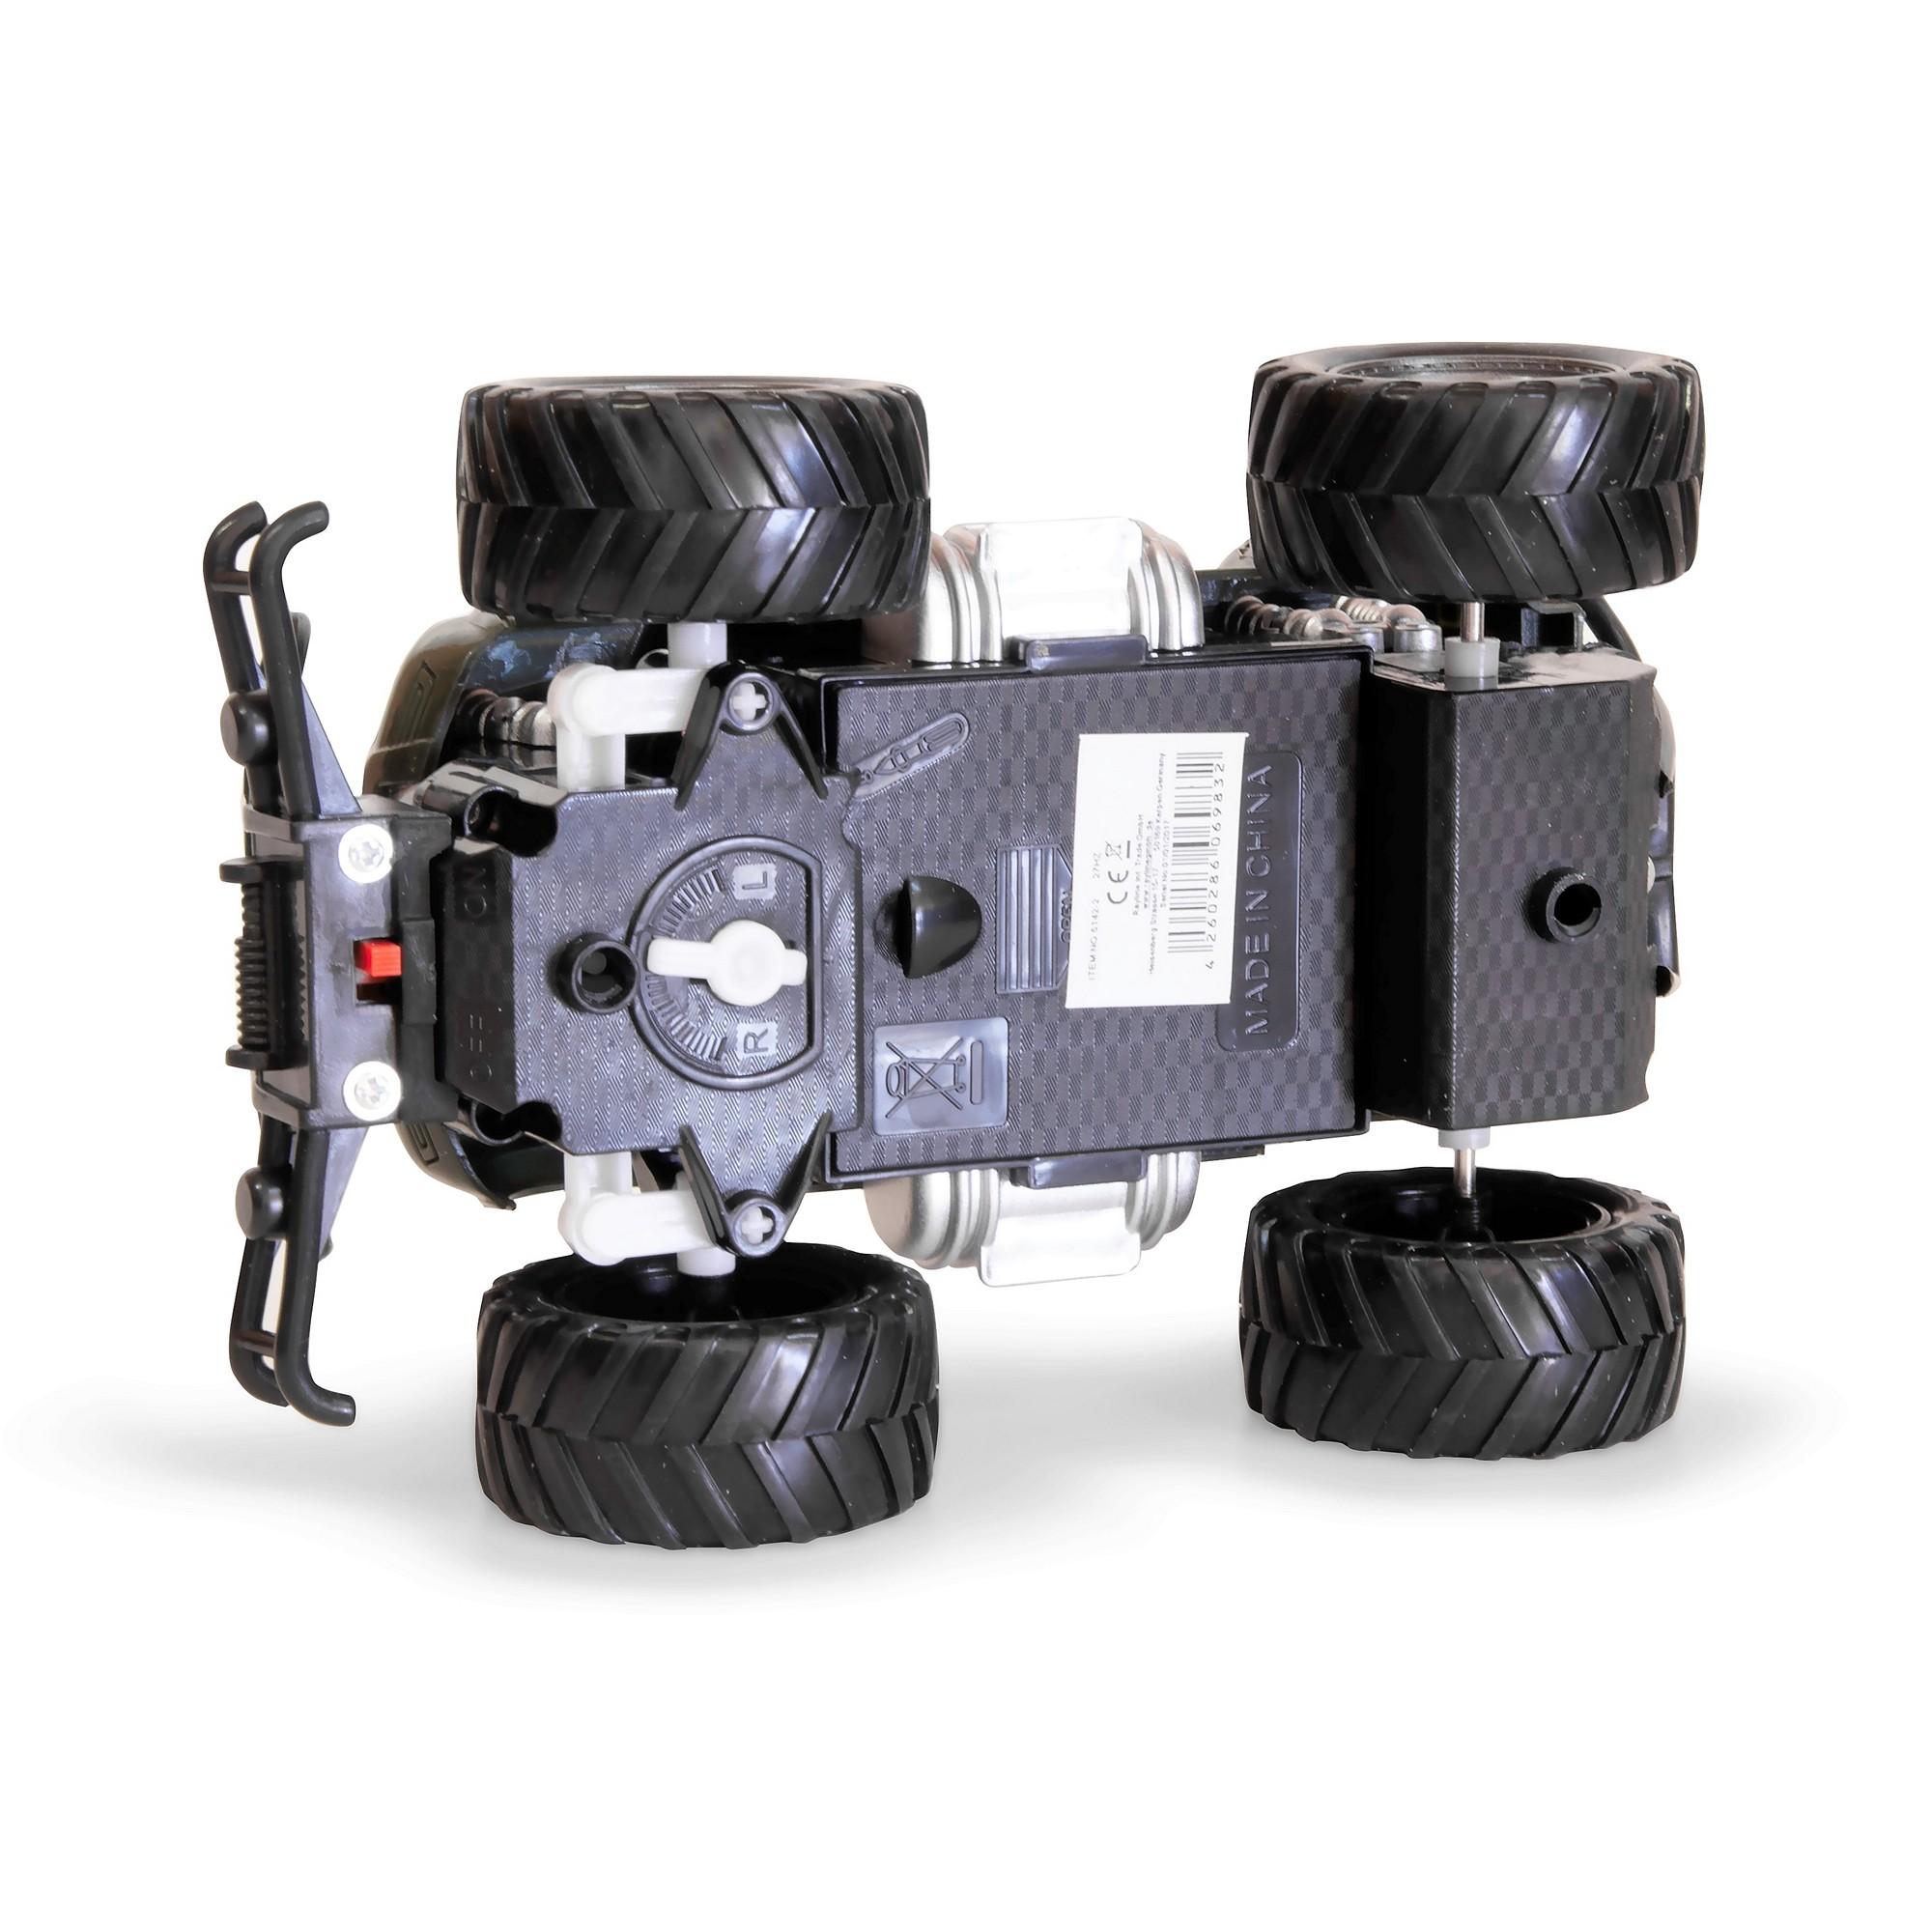 germanseller rc ferngesteuertes auto mini monster truck. Black Bedroom Furniture Sets. Home Design Ideas